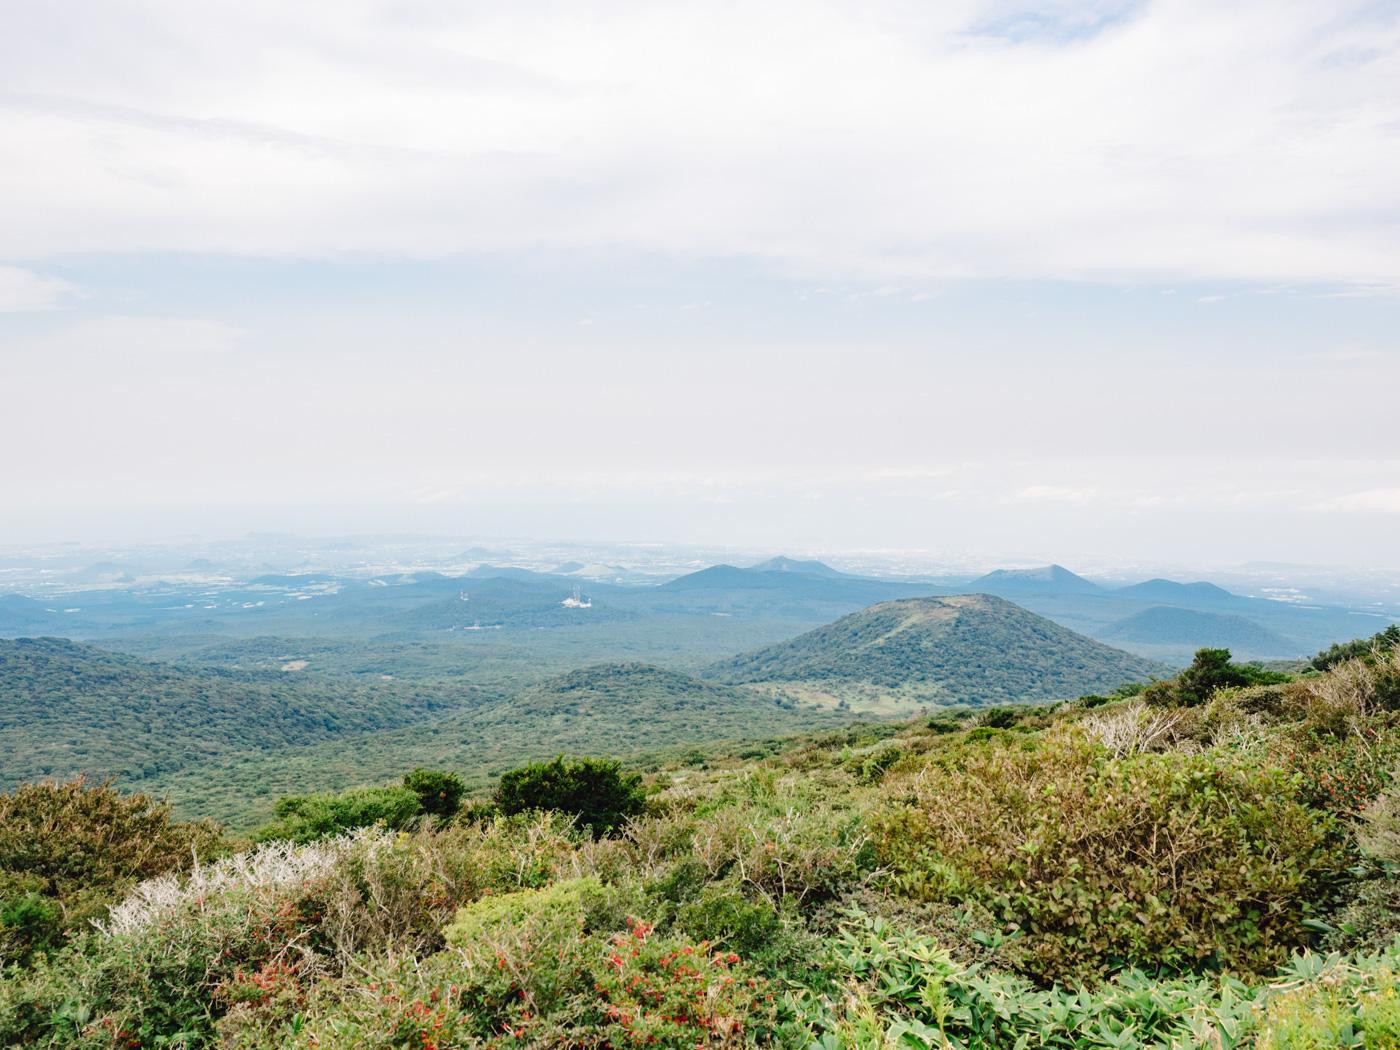 Korea - Mt Hallasan - Magnificent view